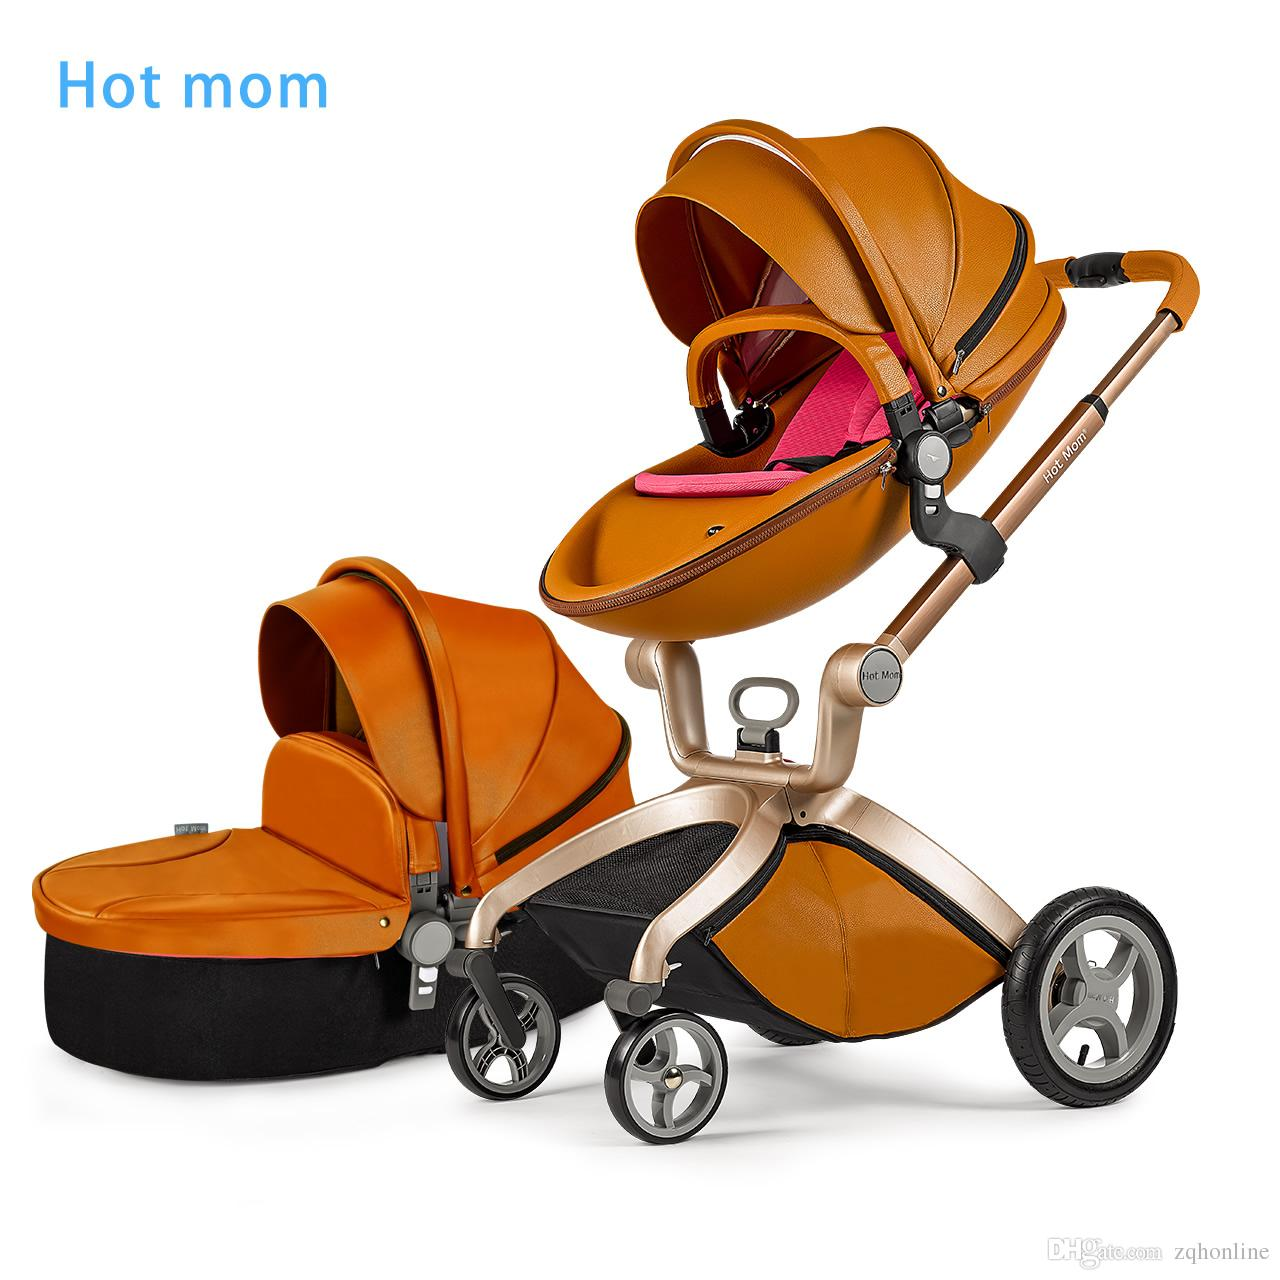 2017 Hotmom Brand Fashion Pu Leather Baby Stroller Pushchair Egg.